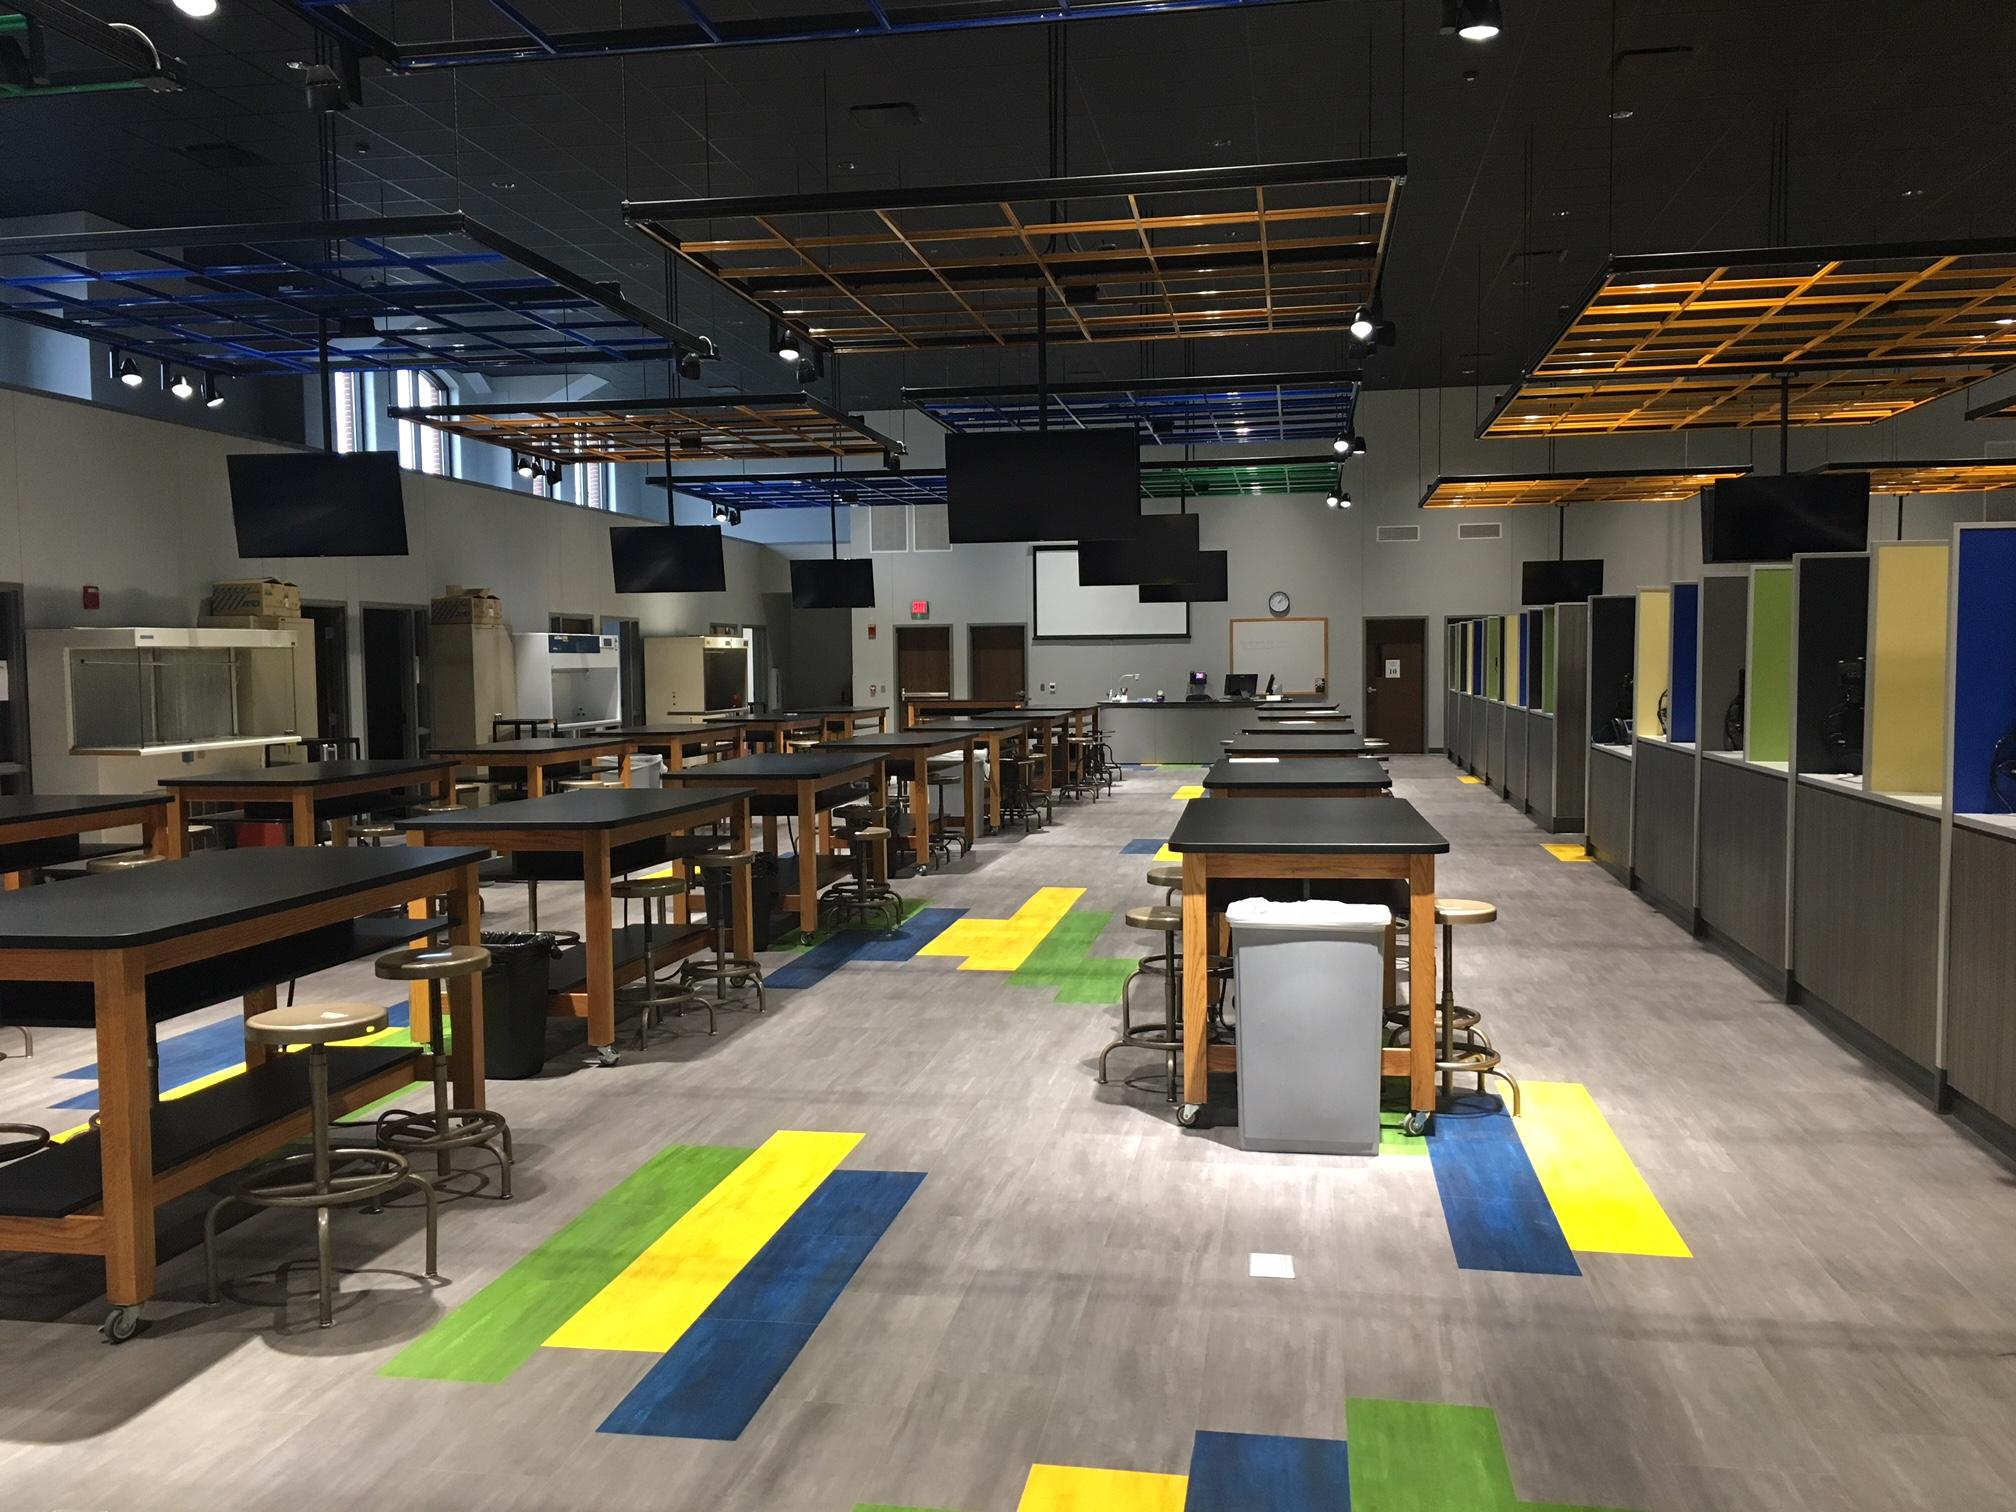 New Creighton University Gym Renovation Lab.jpg